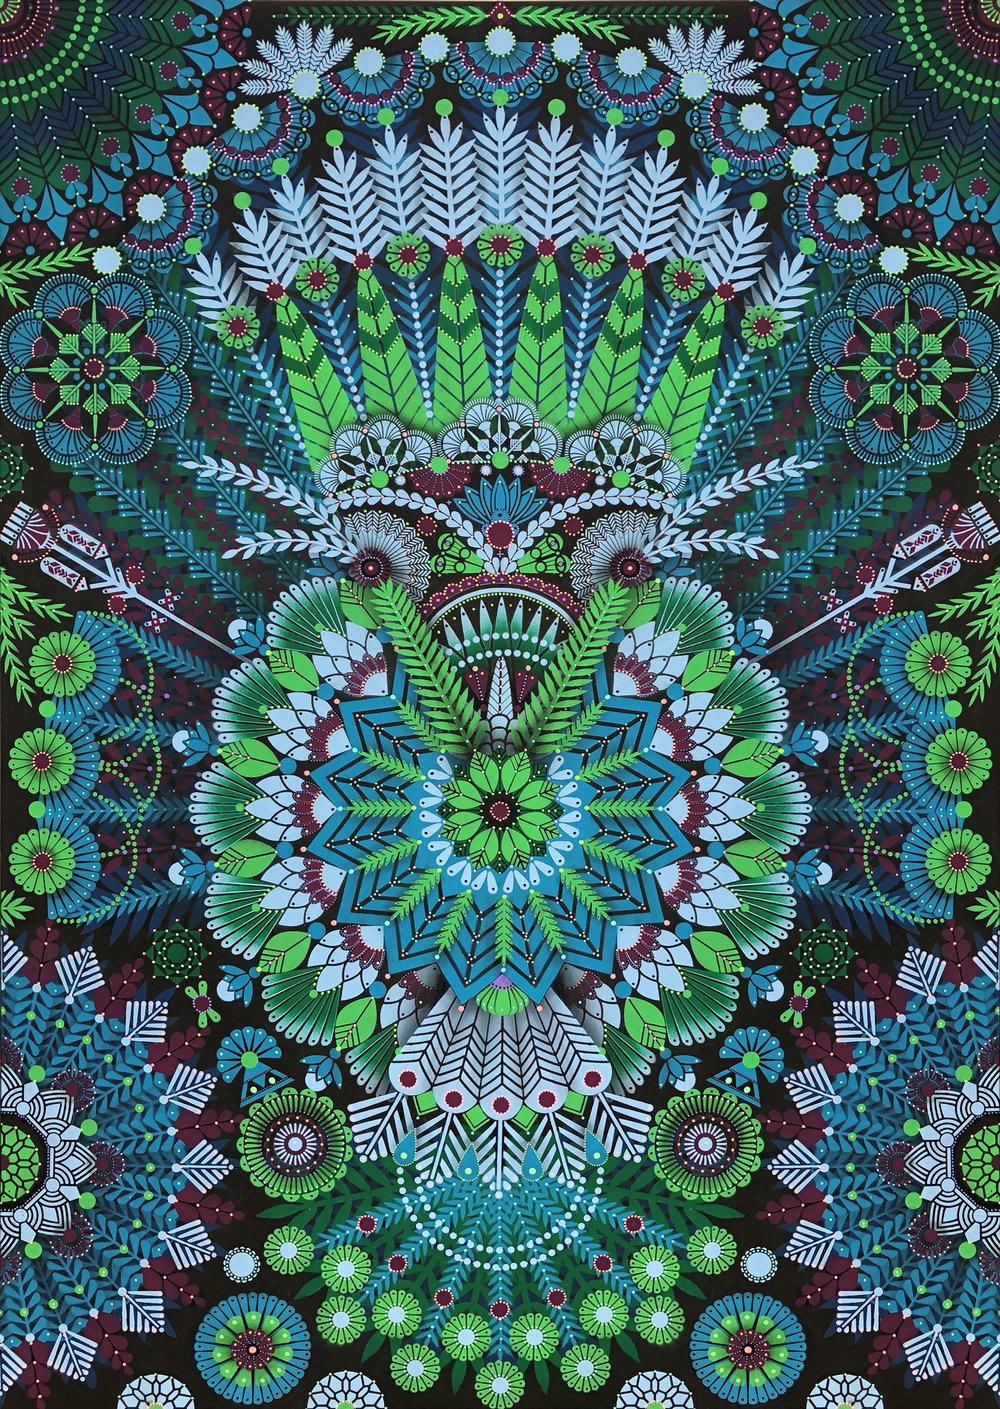 Kaleidoscopic Nature #4  - Acrylic on canvas, 162 x 114 cm   2018